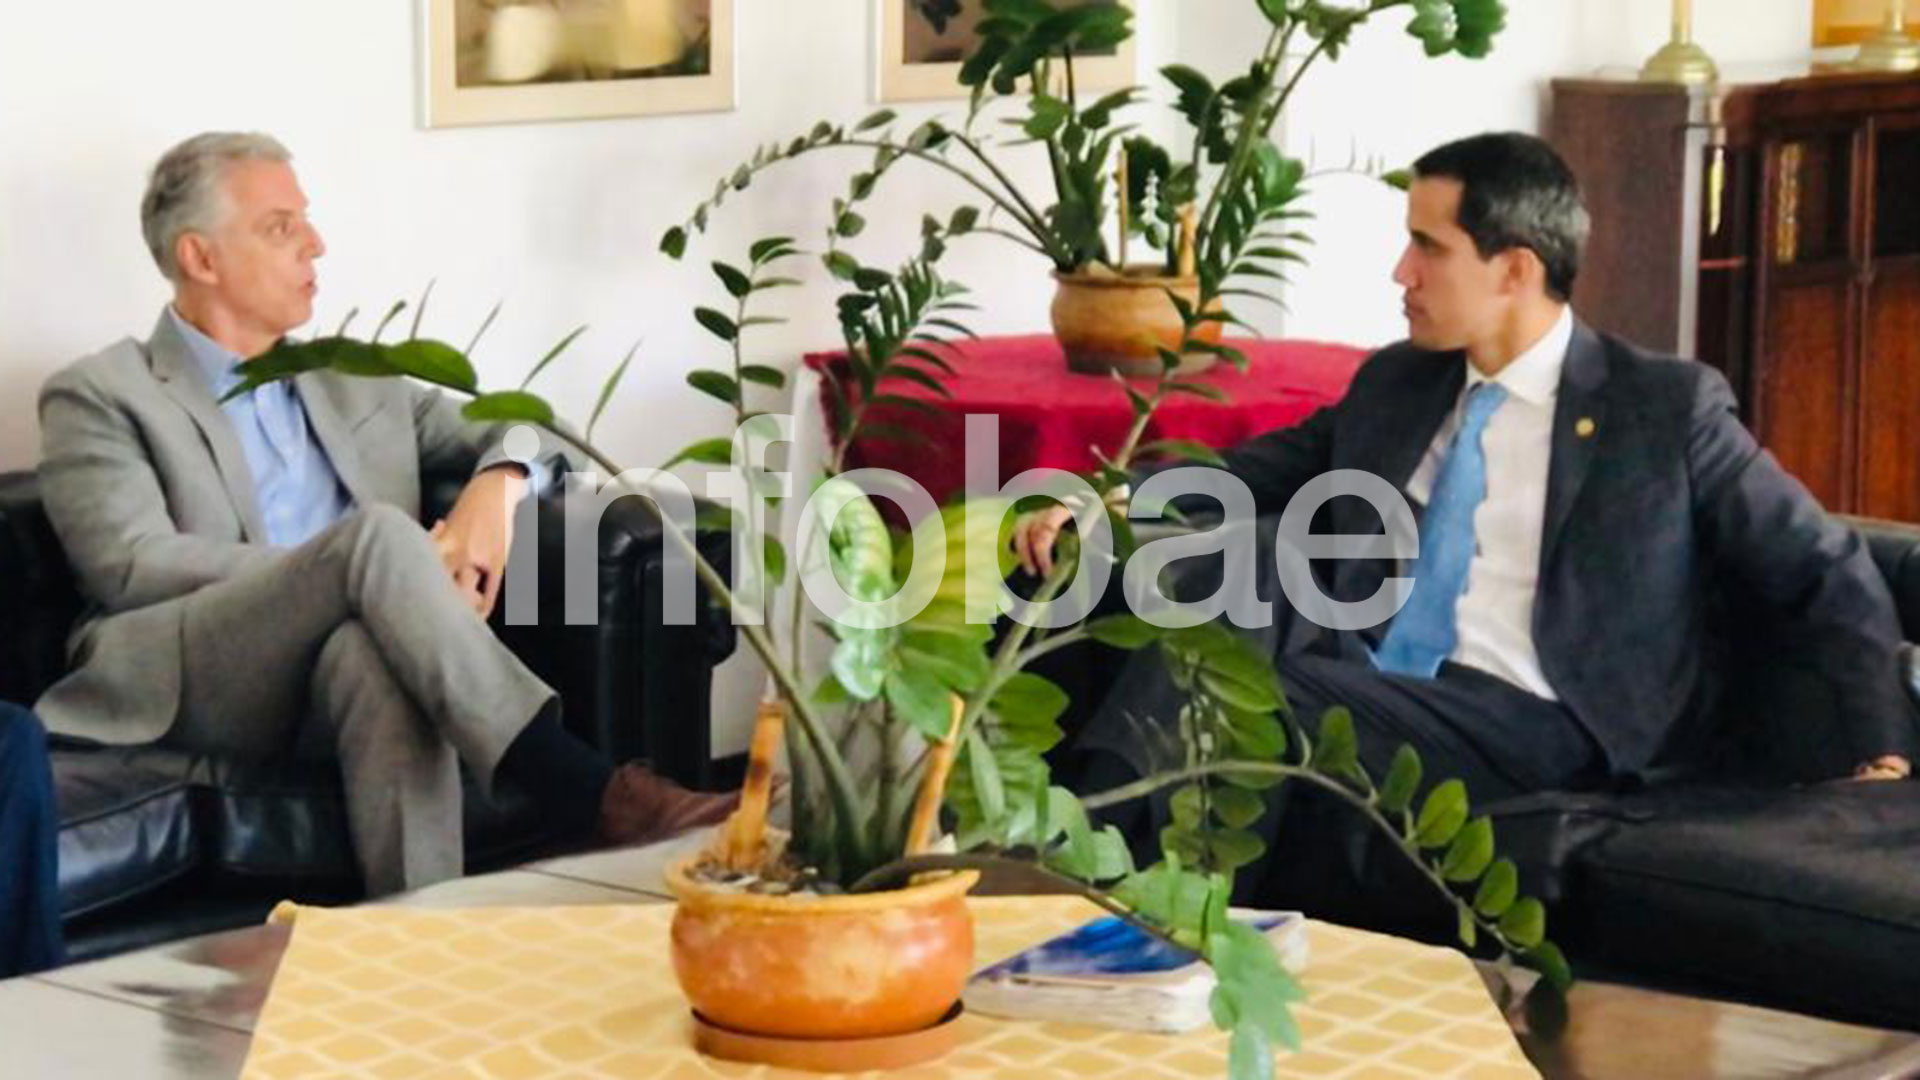 Juan Guaidó junto a Eduardo Porretti, al visitar la residencia de la embajada argentina a comienzos de febrero.